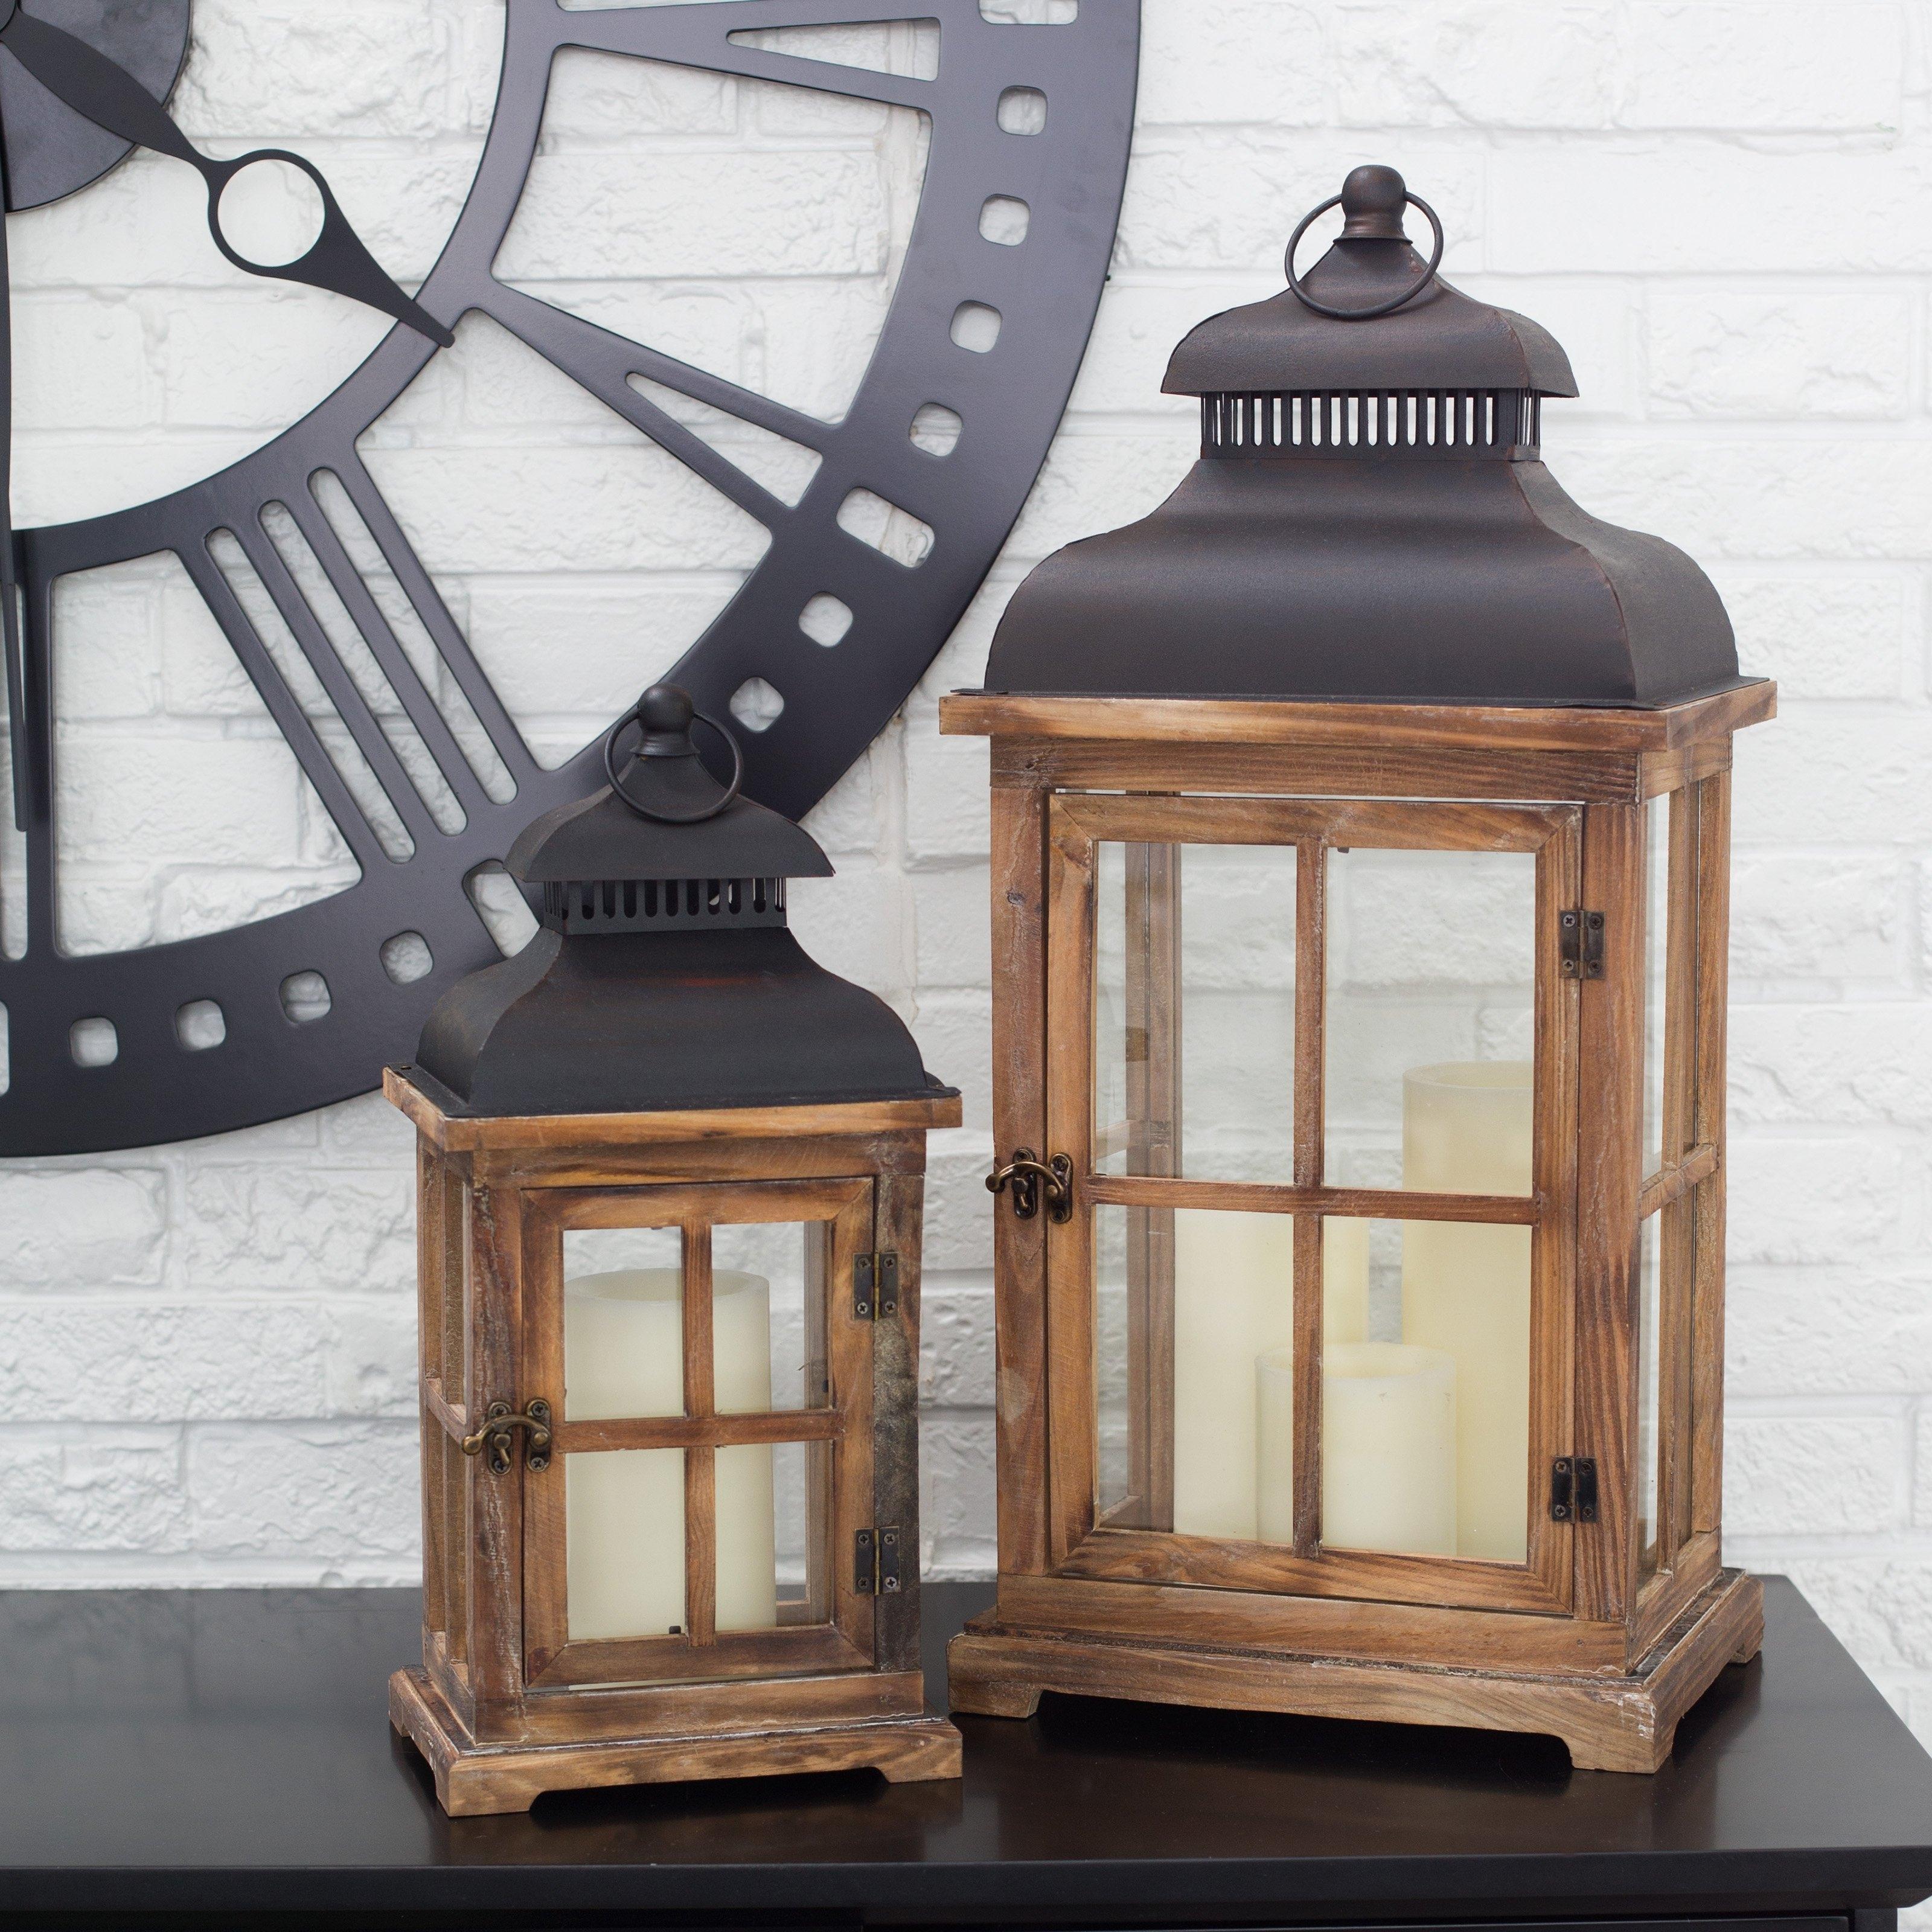 Large Outdoor Decorative Lanterns – Outdoor Ideas Regarding Most Popular Large Outdoor Rustic Lanterns (View 7 of 20)